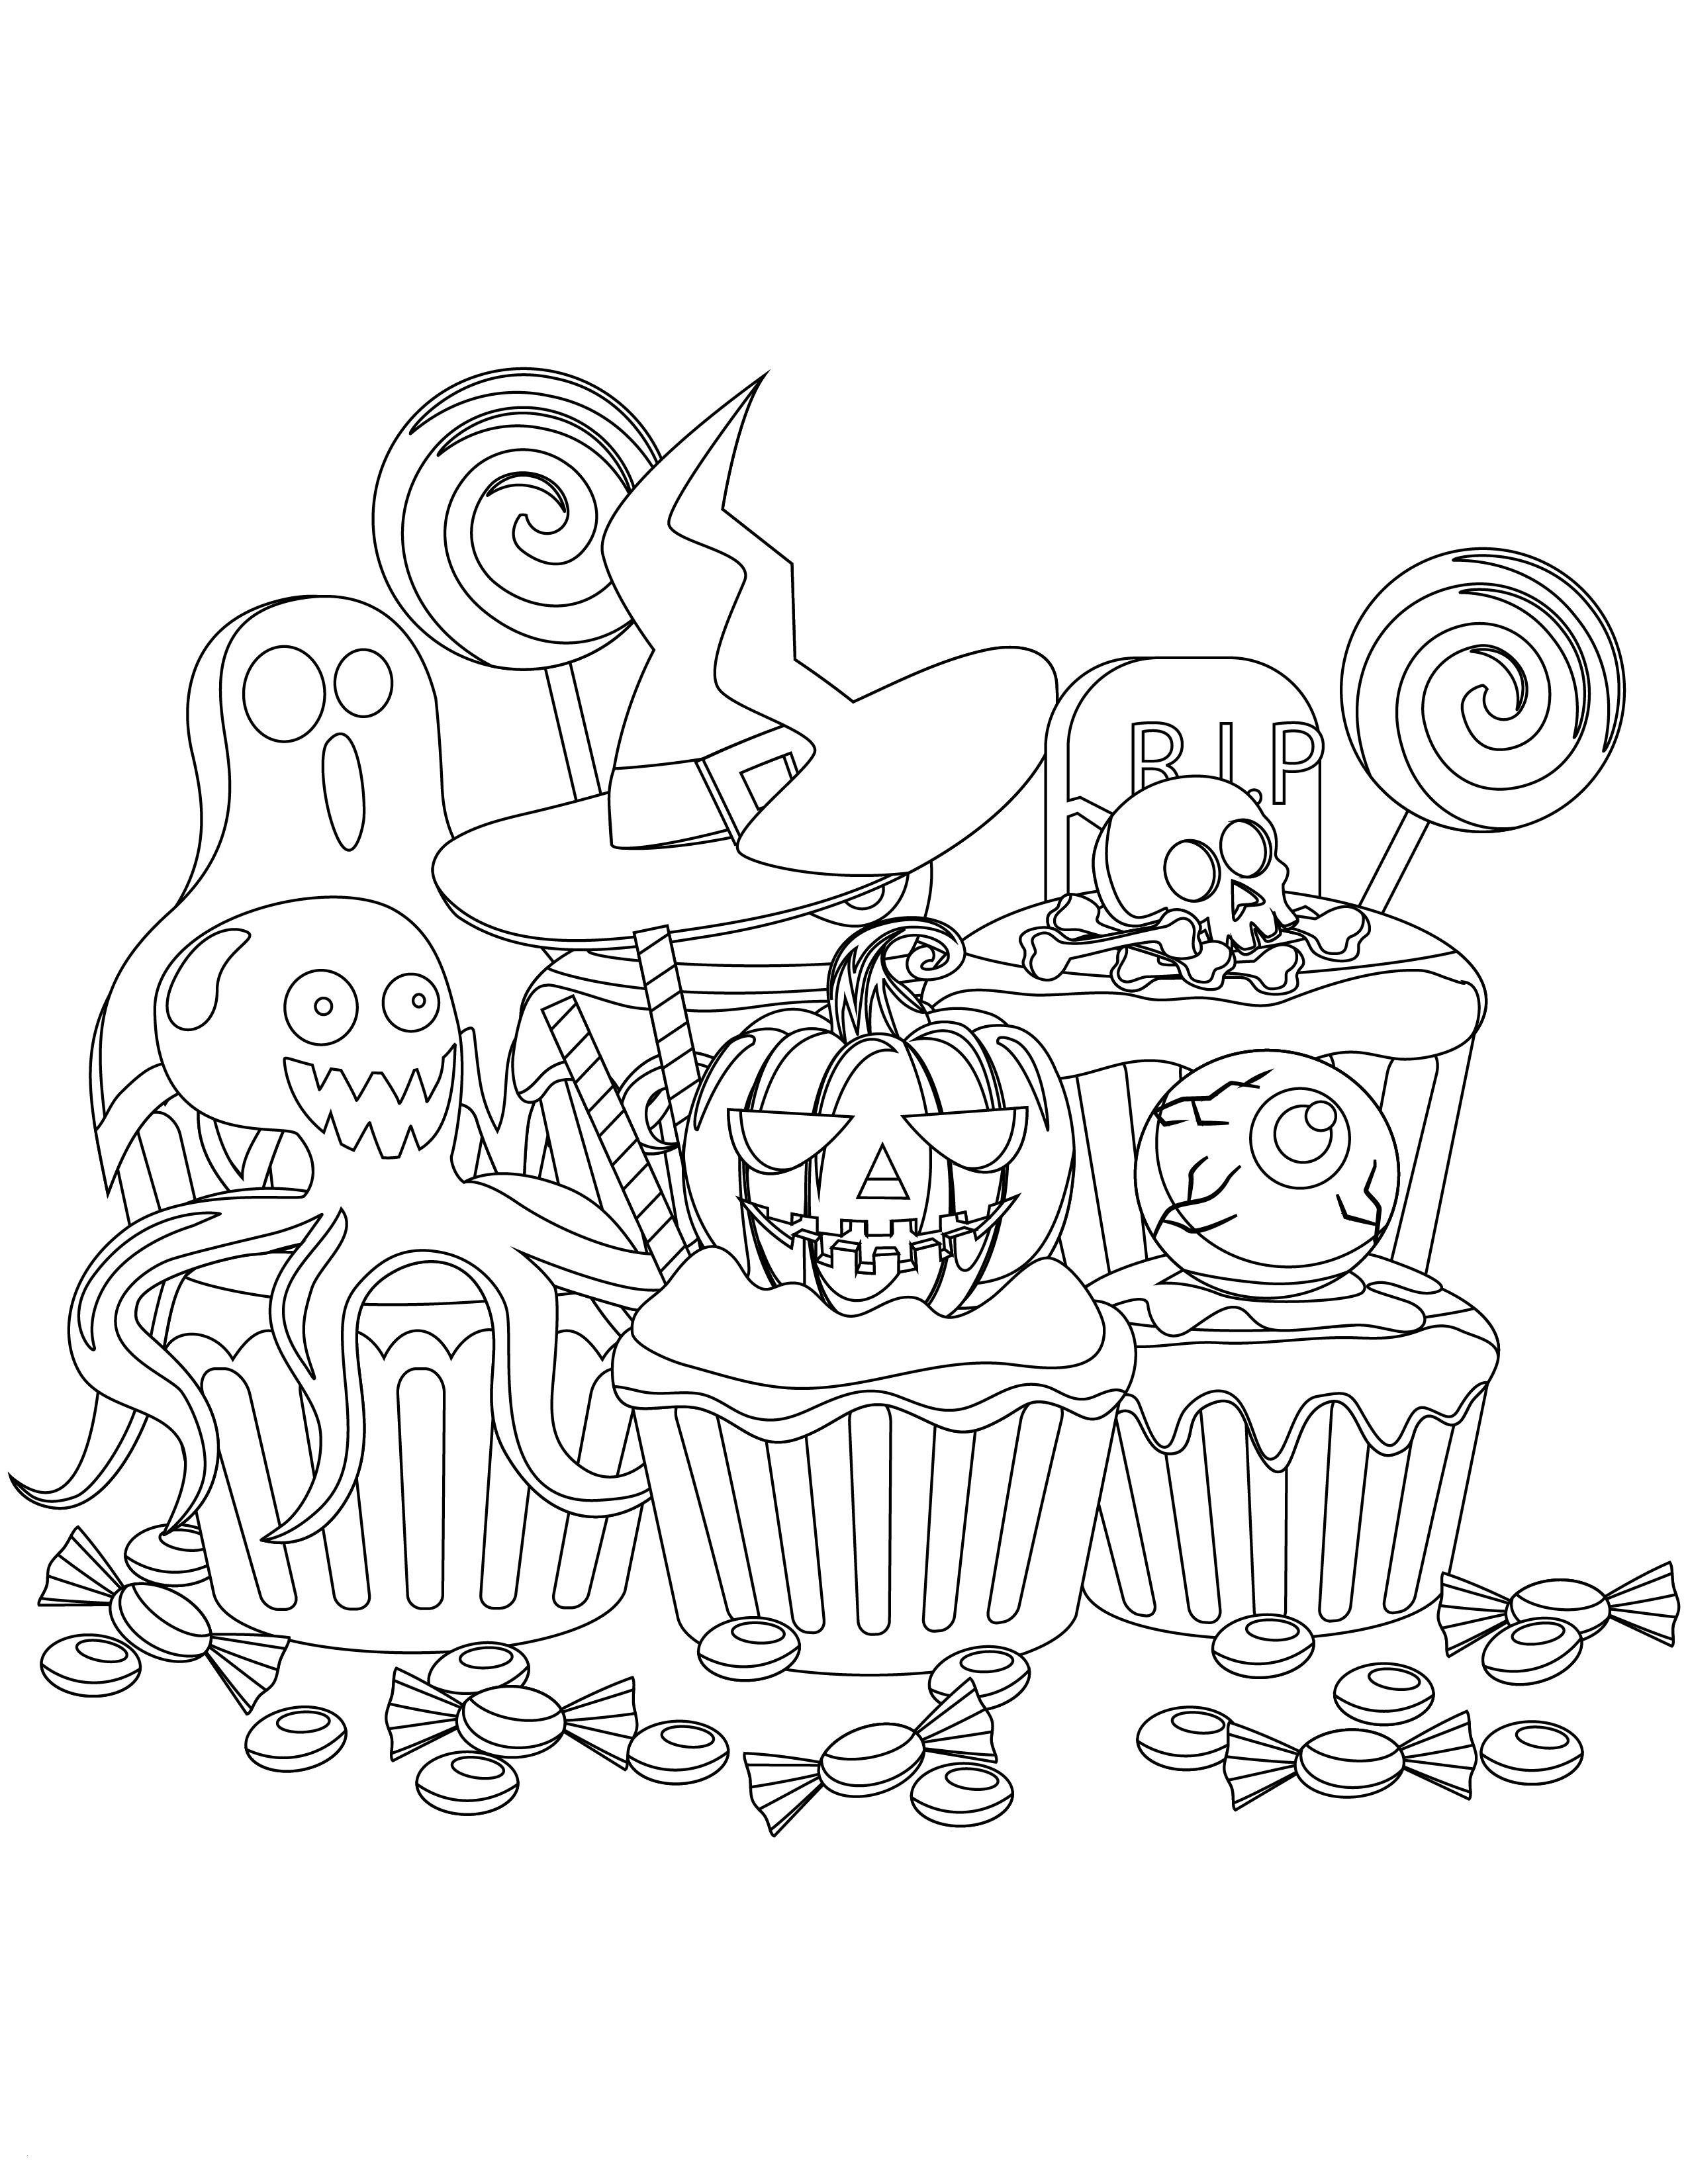 Cupcake Zum Ausmalen Neu 40 Vampir Malvorlagen Scoredatscore Frisch Ausmalbilder Cupcakes Stock